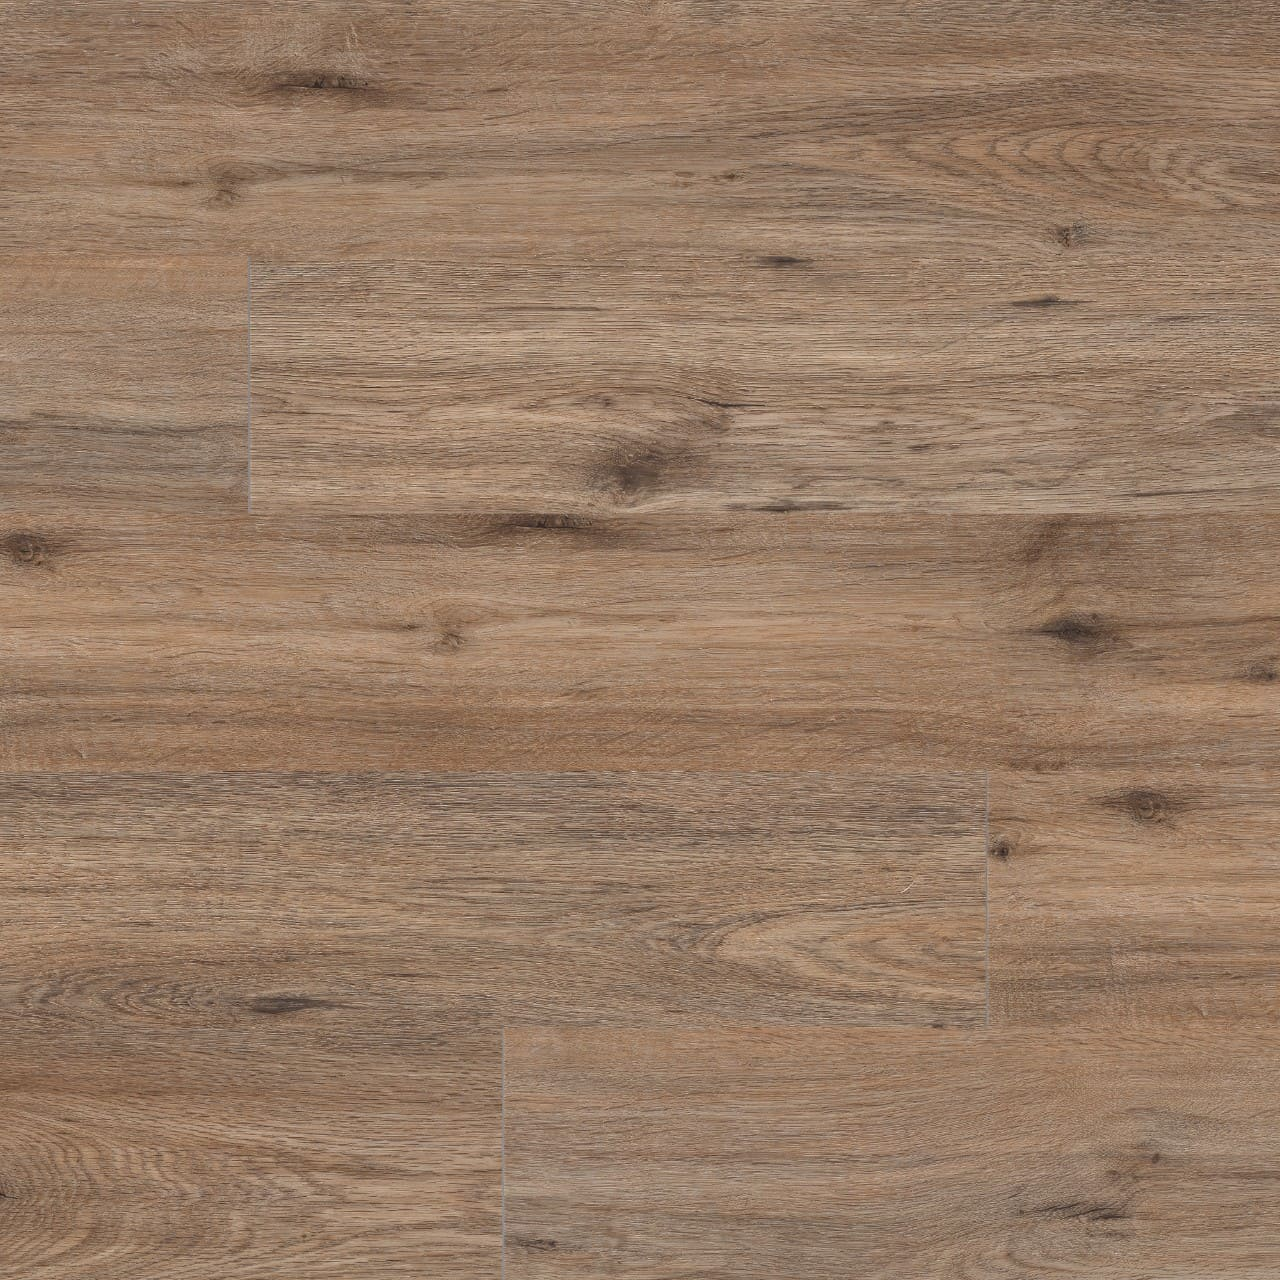 Prescott Fauna Vinyl Plank Flooring